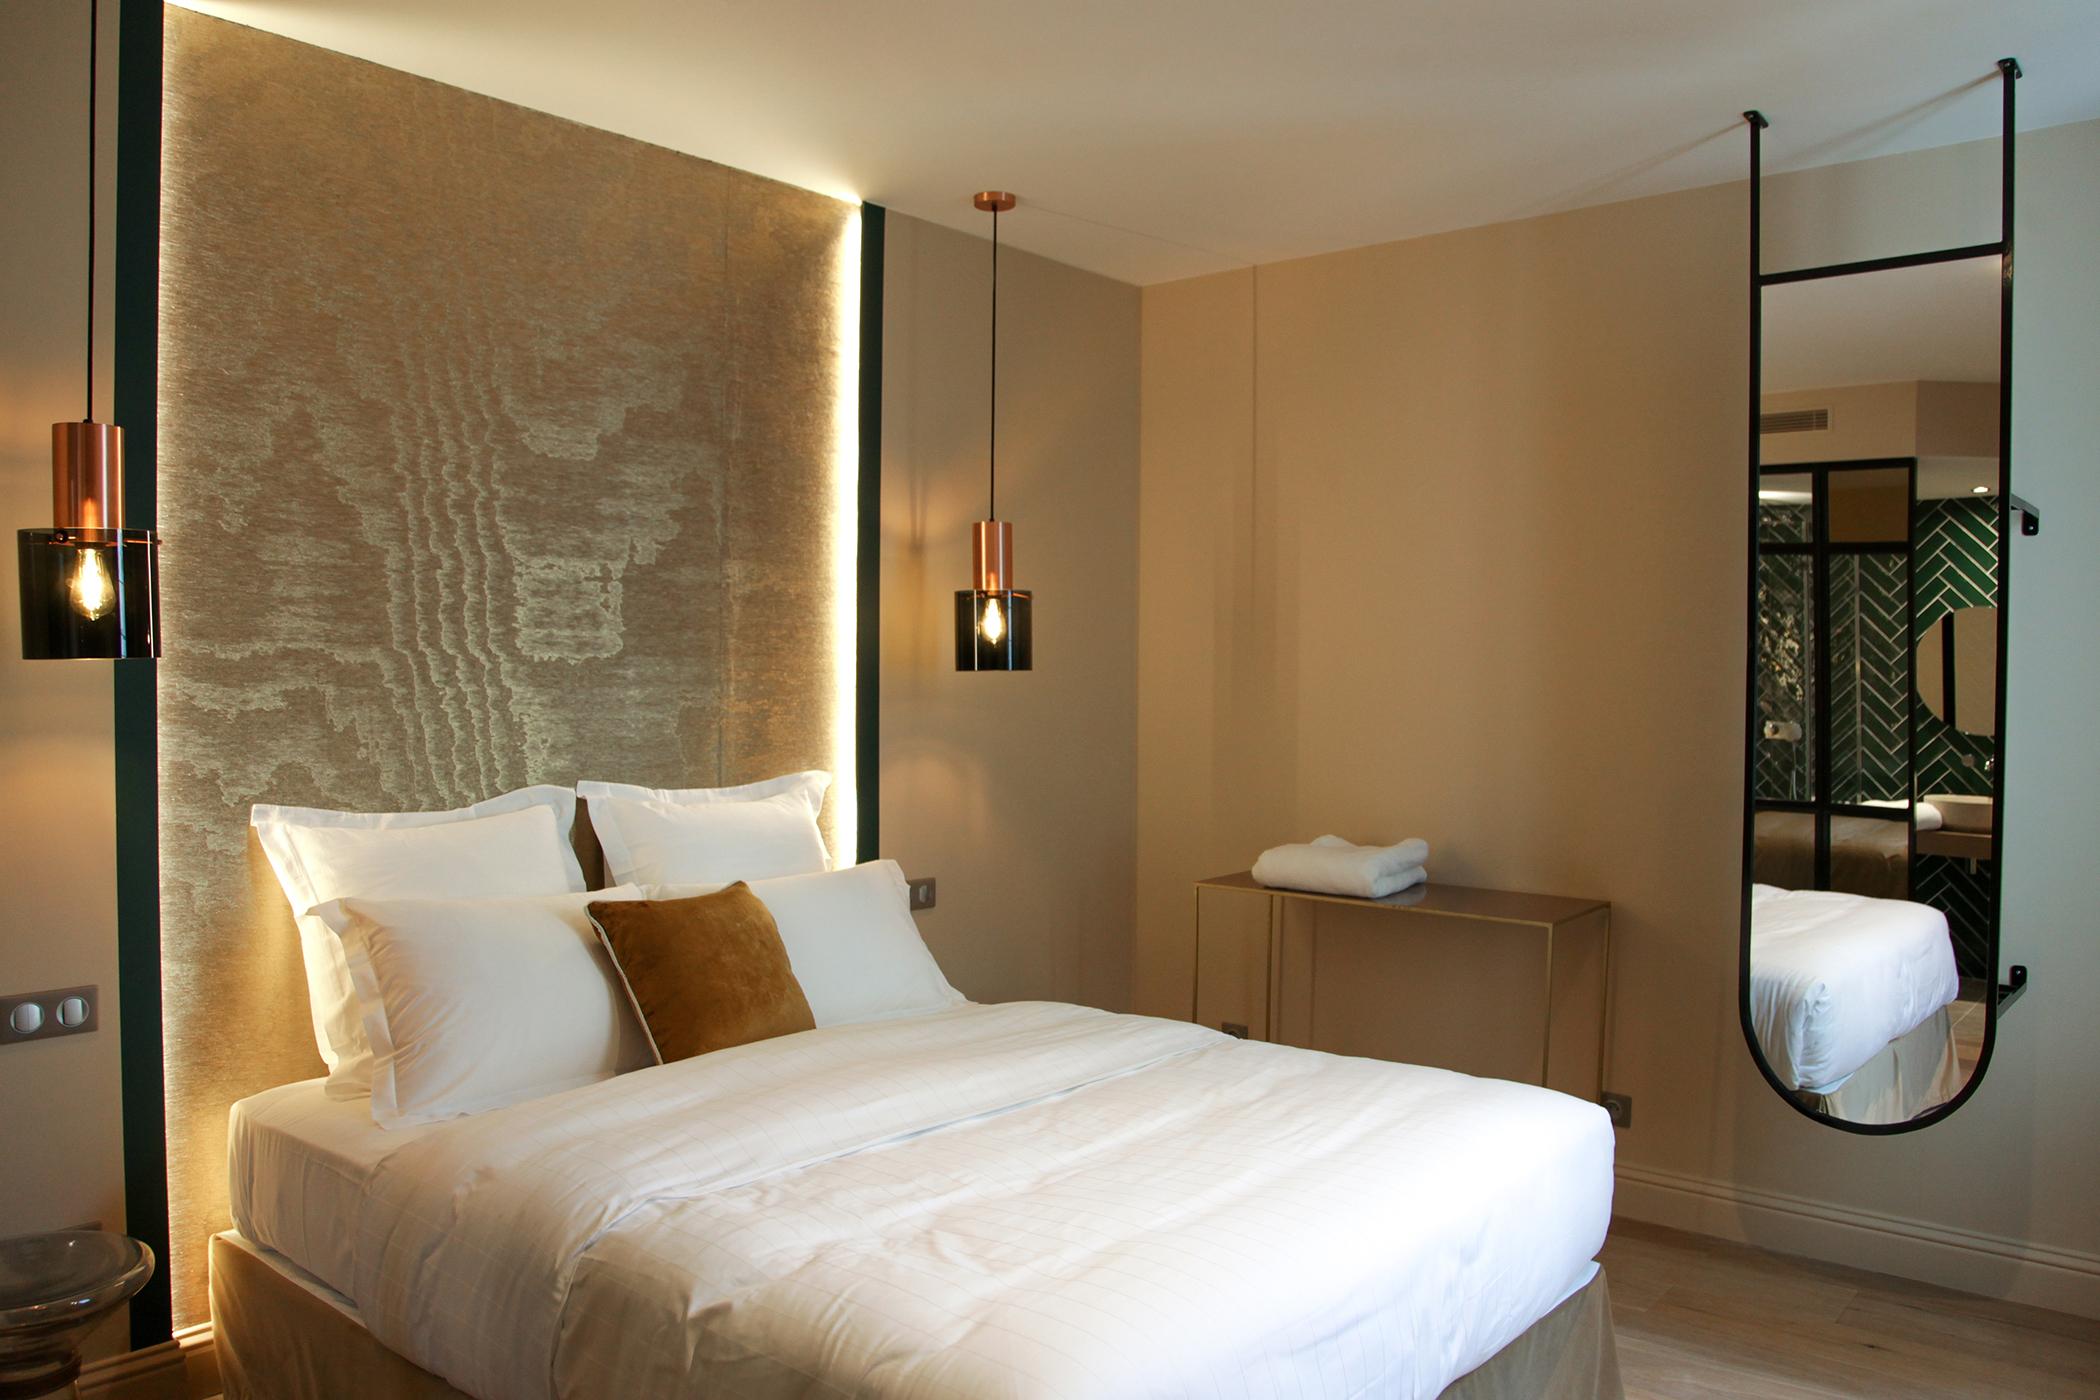 galerie_0010_hotelsingulier-10